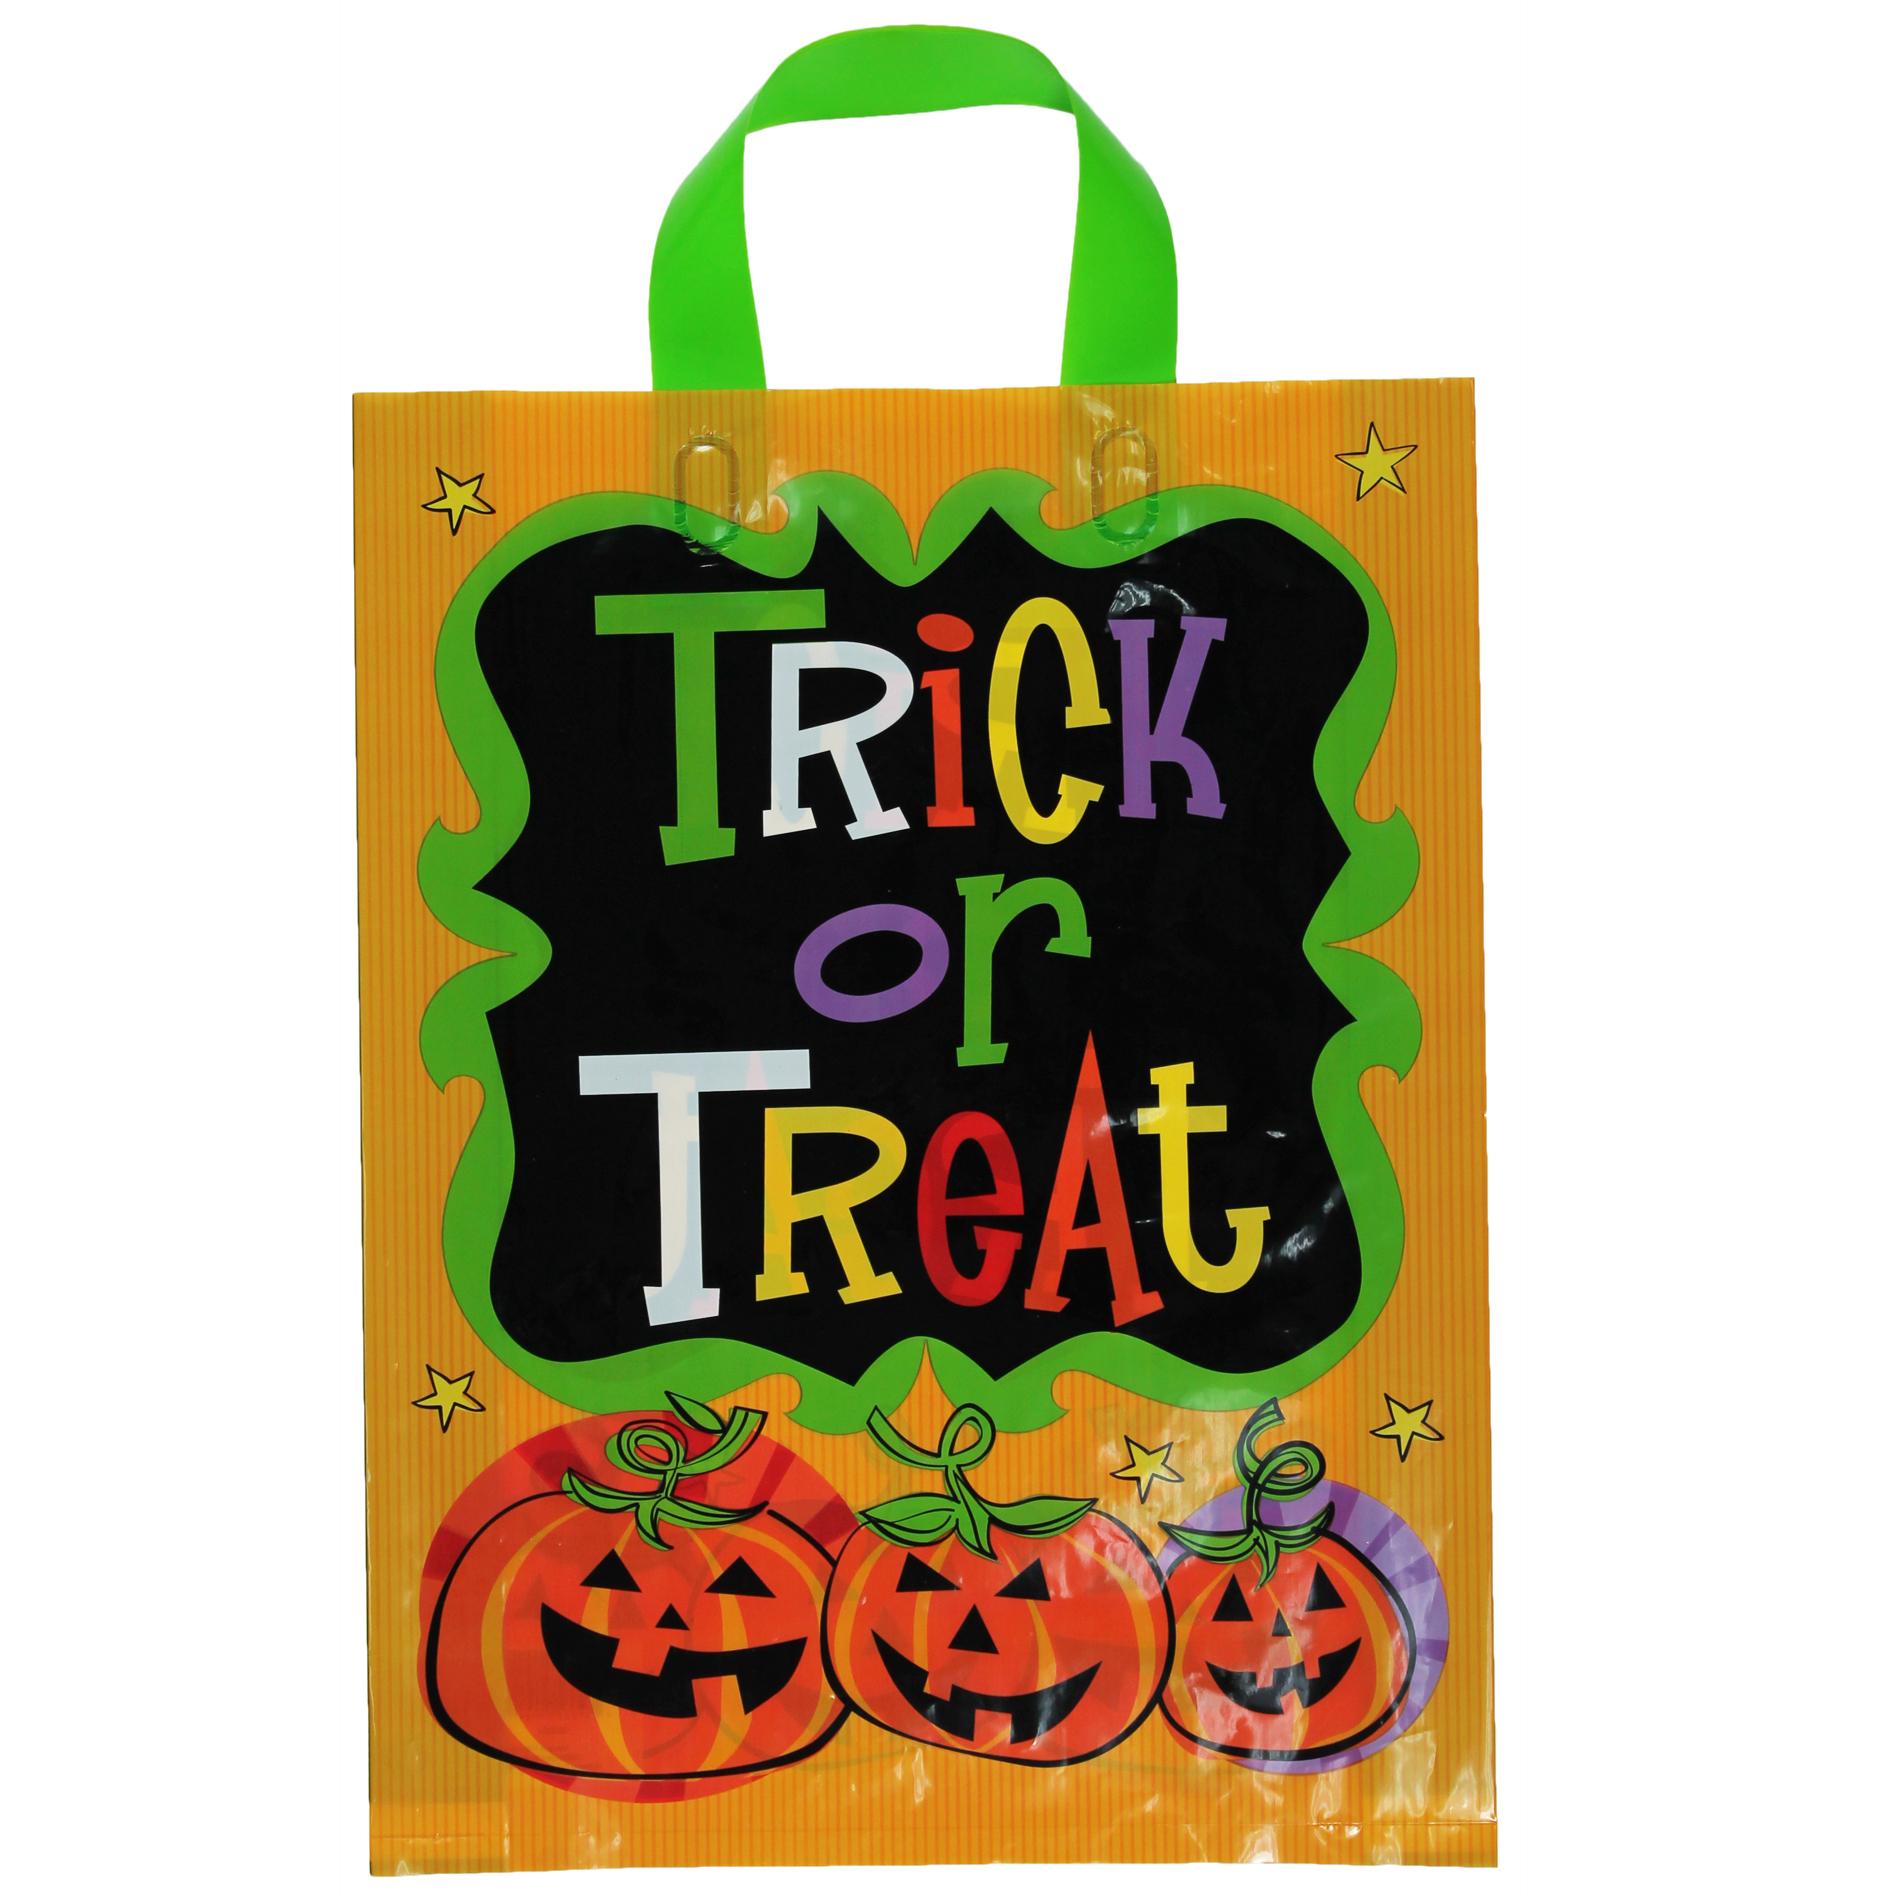 Totally Ghoul Trick or Treat Bag PartNumber: 009W007701139003P KsnValue: 7701139 MfgPartNumber: KM800000